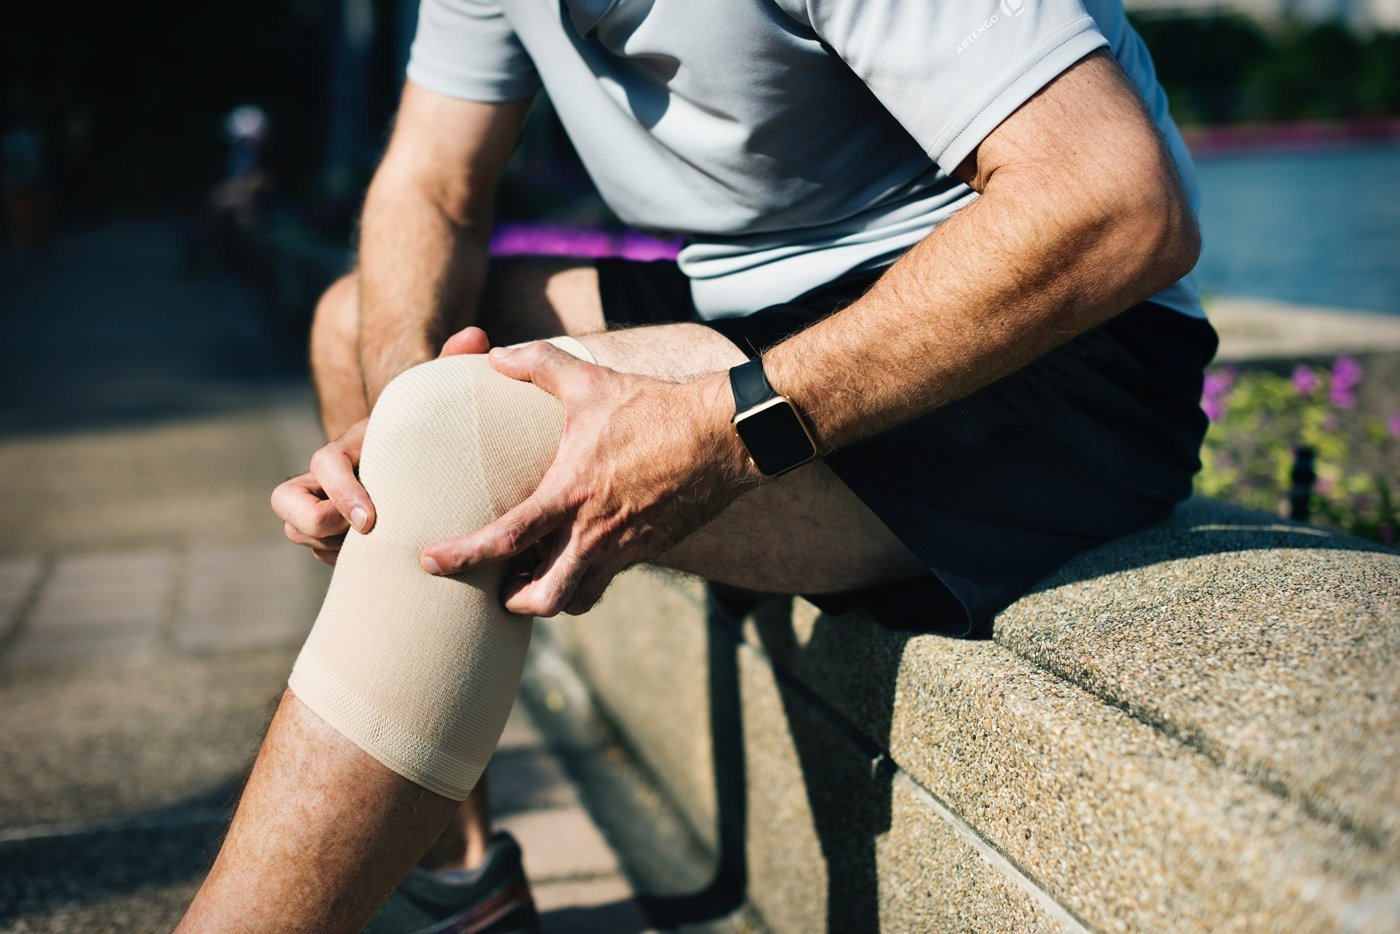 stretchingpro-comment-soigner-douleurs-genoux